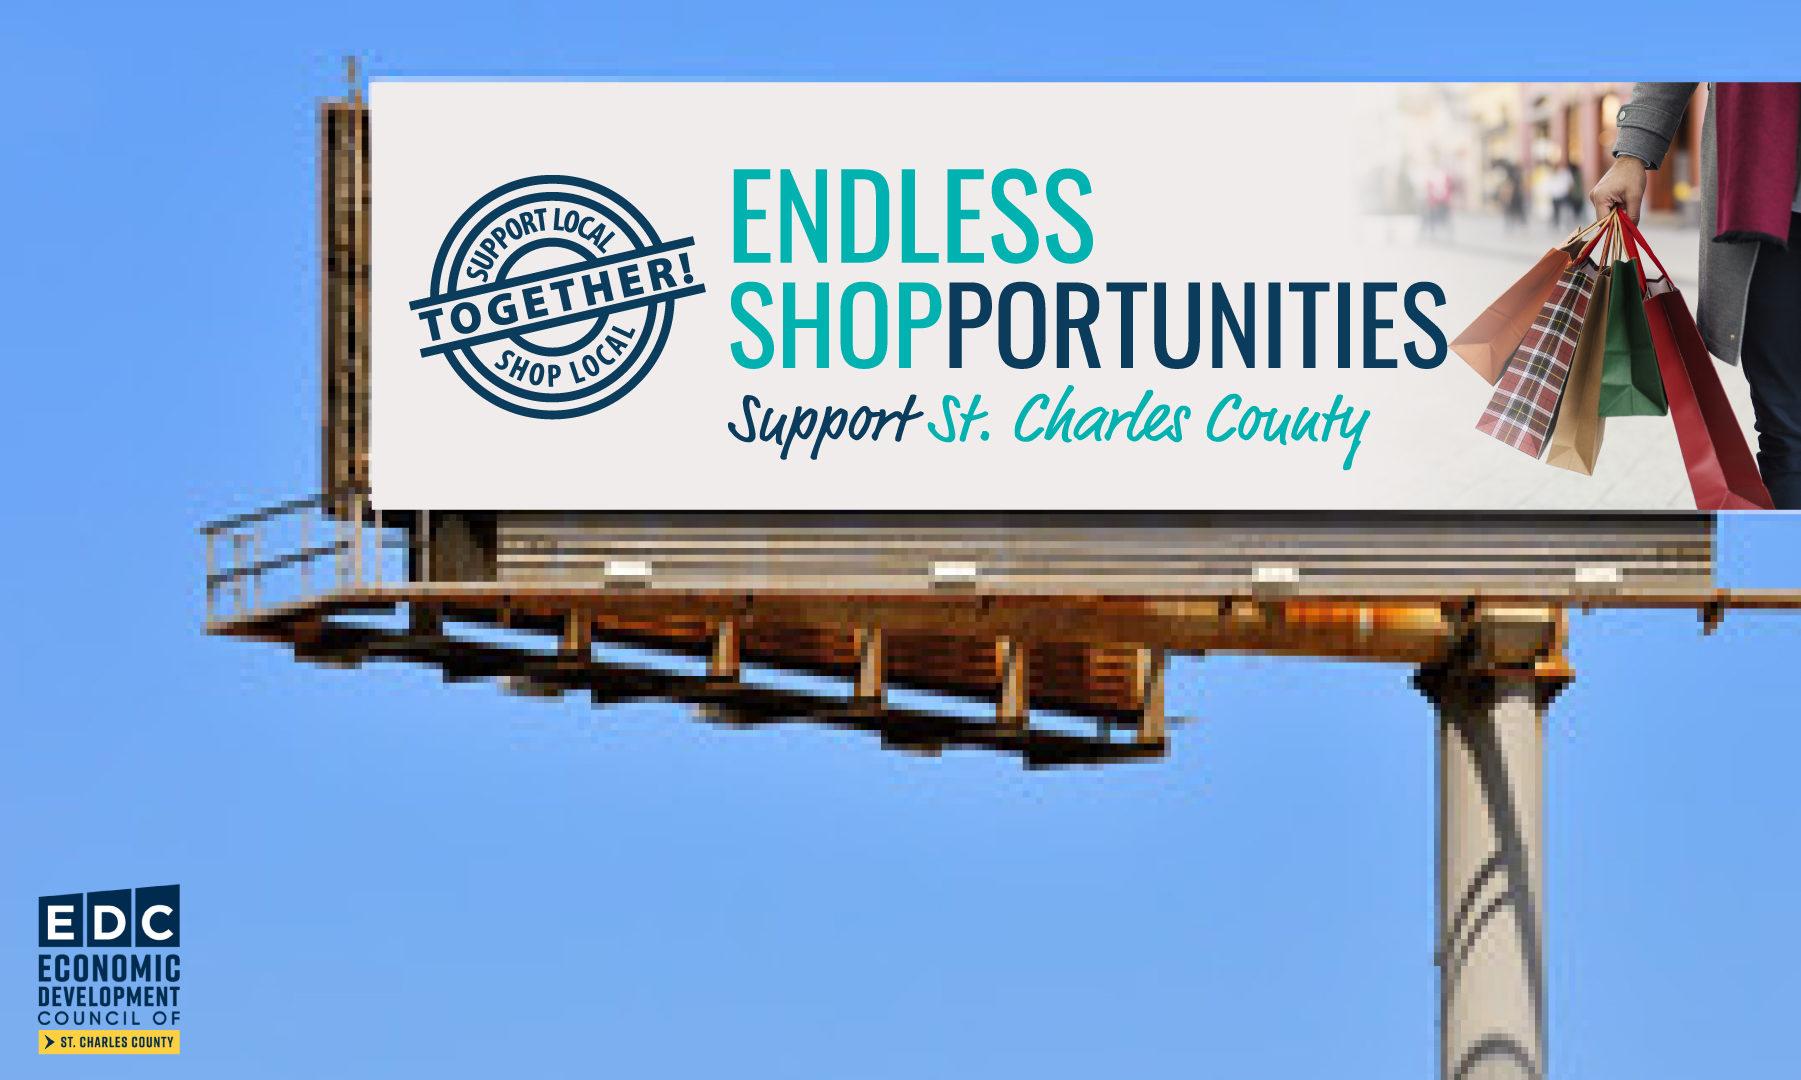 EDC of St. Charles Billboard